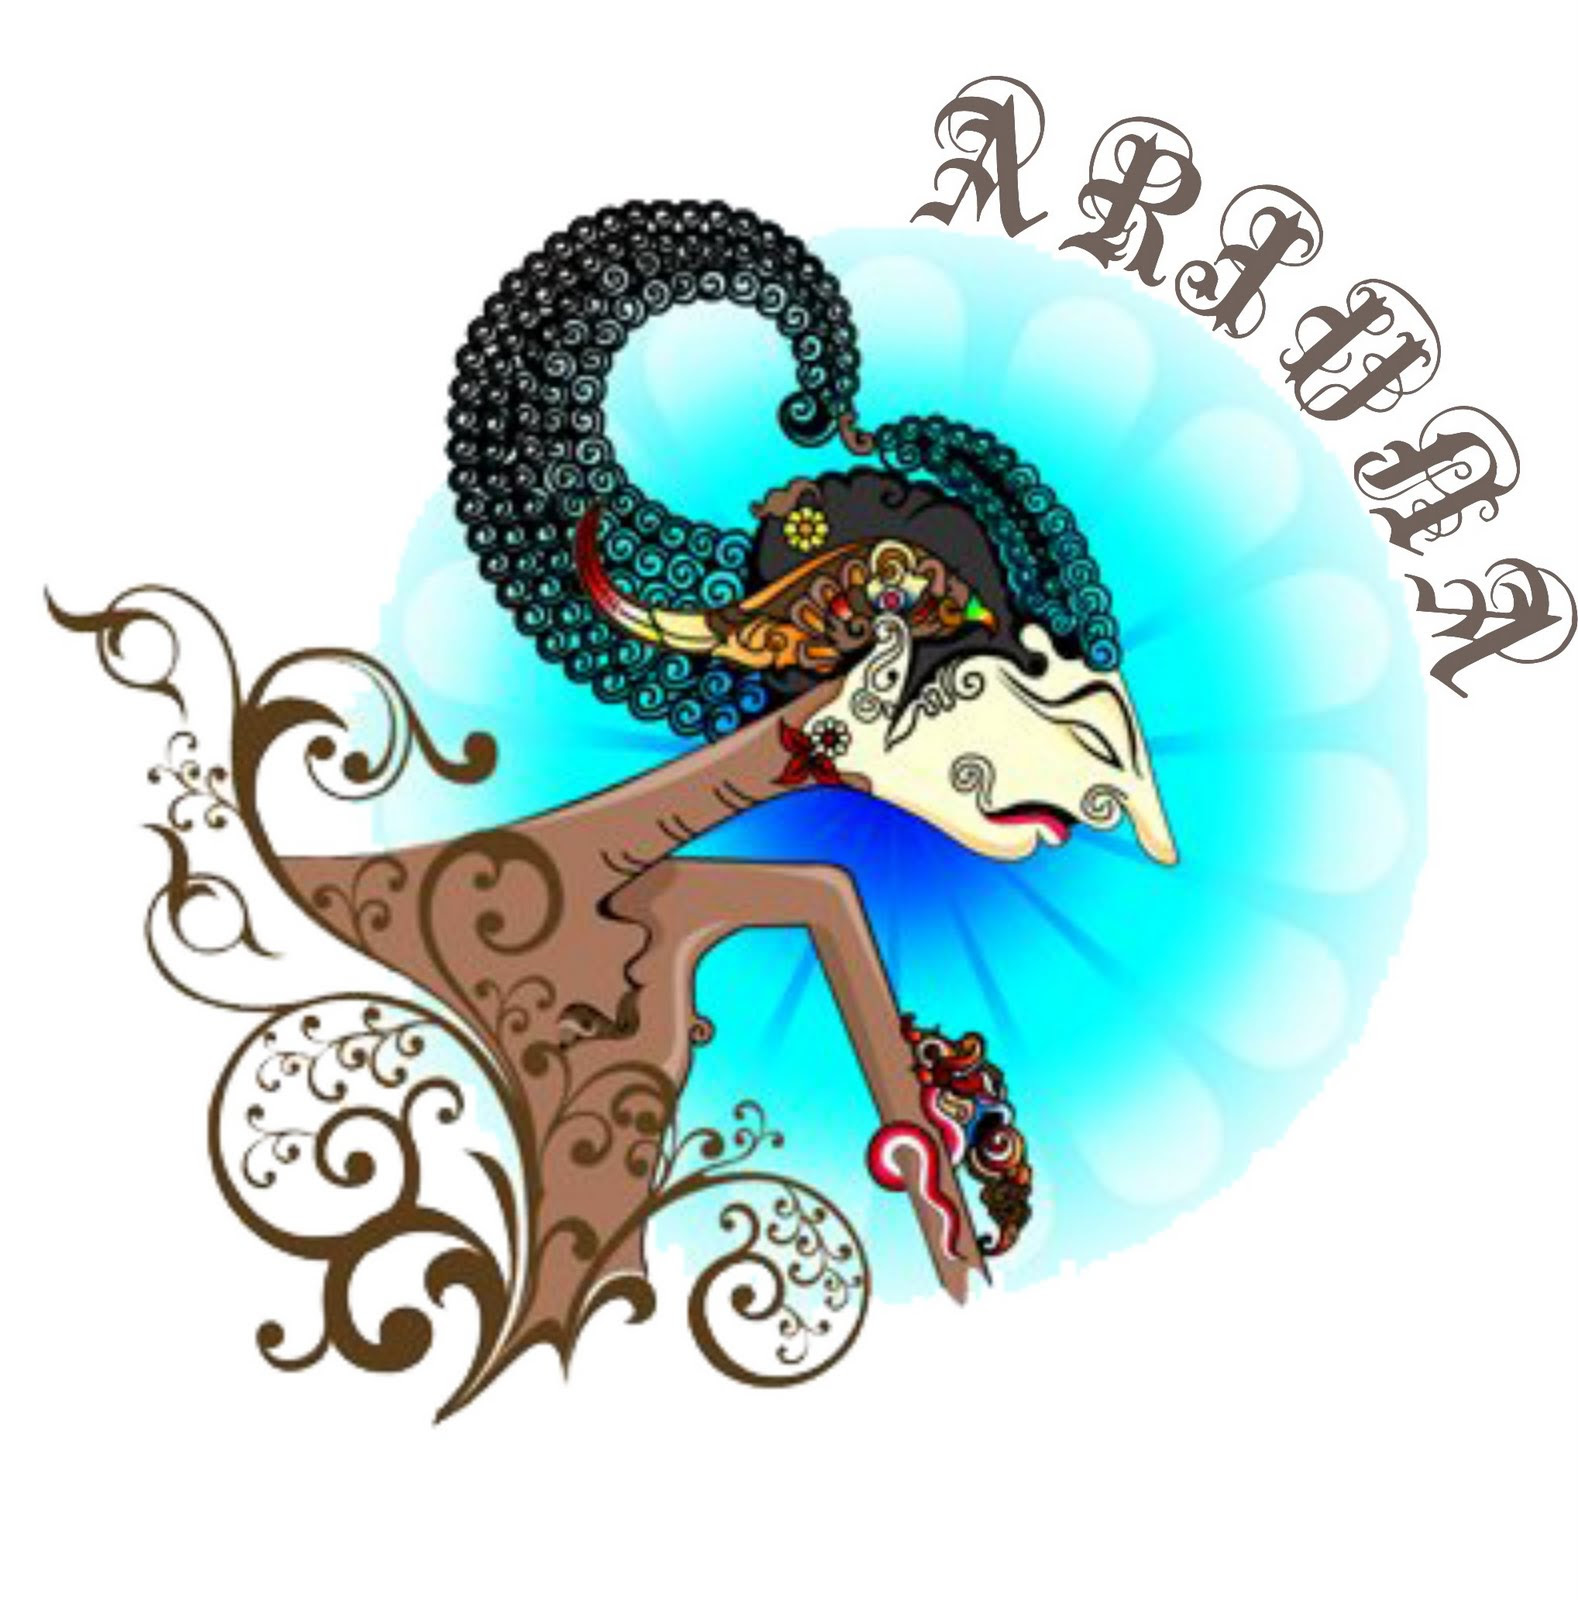 Arjuna Junglekey In Image